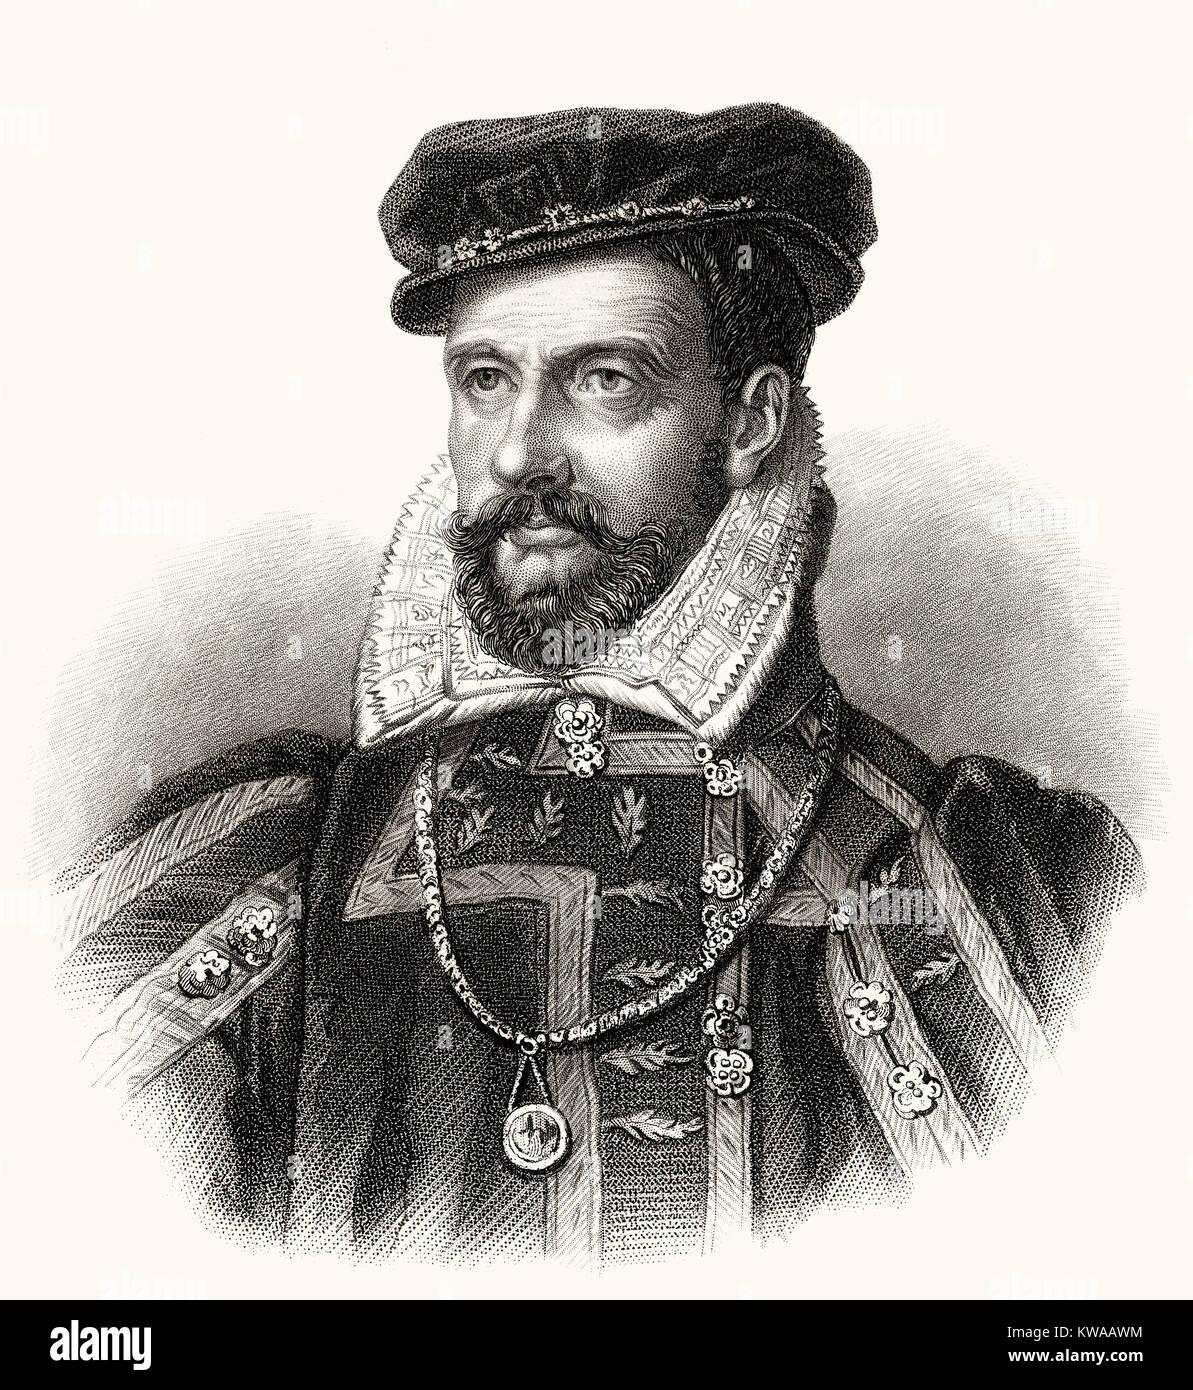 Gaspard II de Coligny, Comte de Coligny, 1519 - 1572, a French Huguenot leader - Stock Image